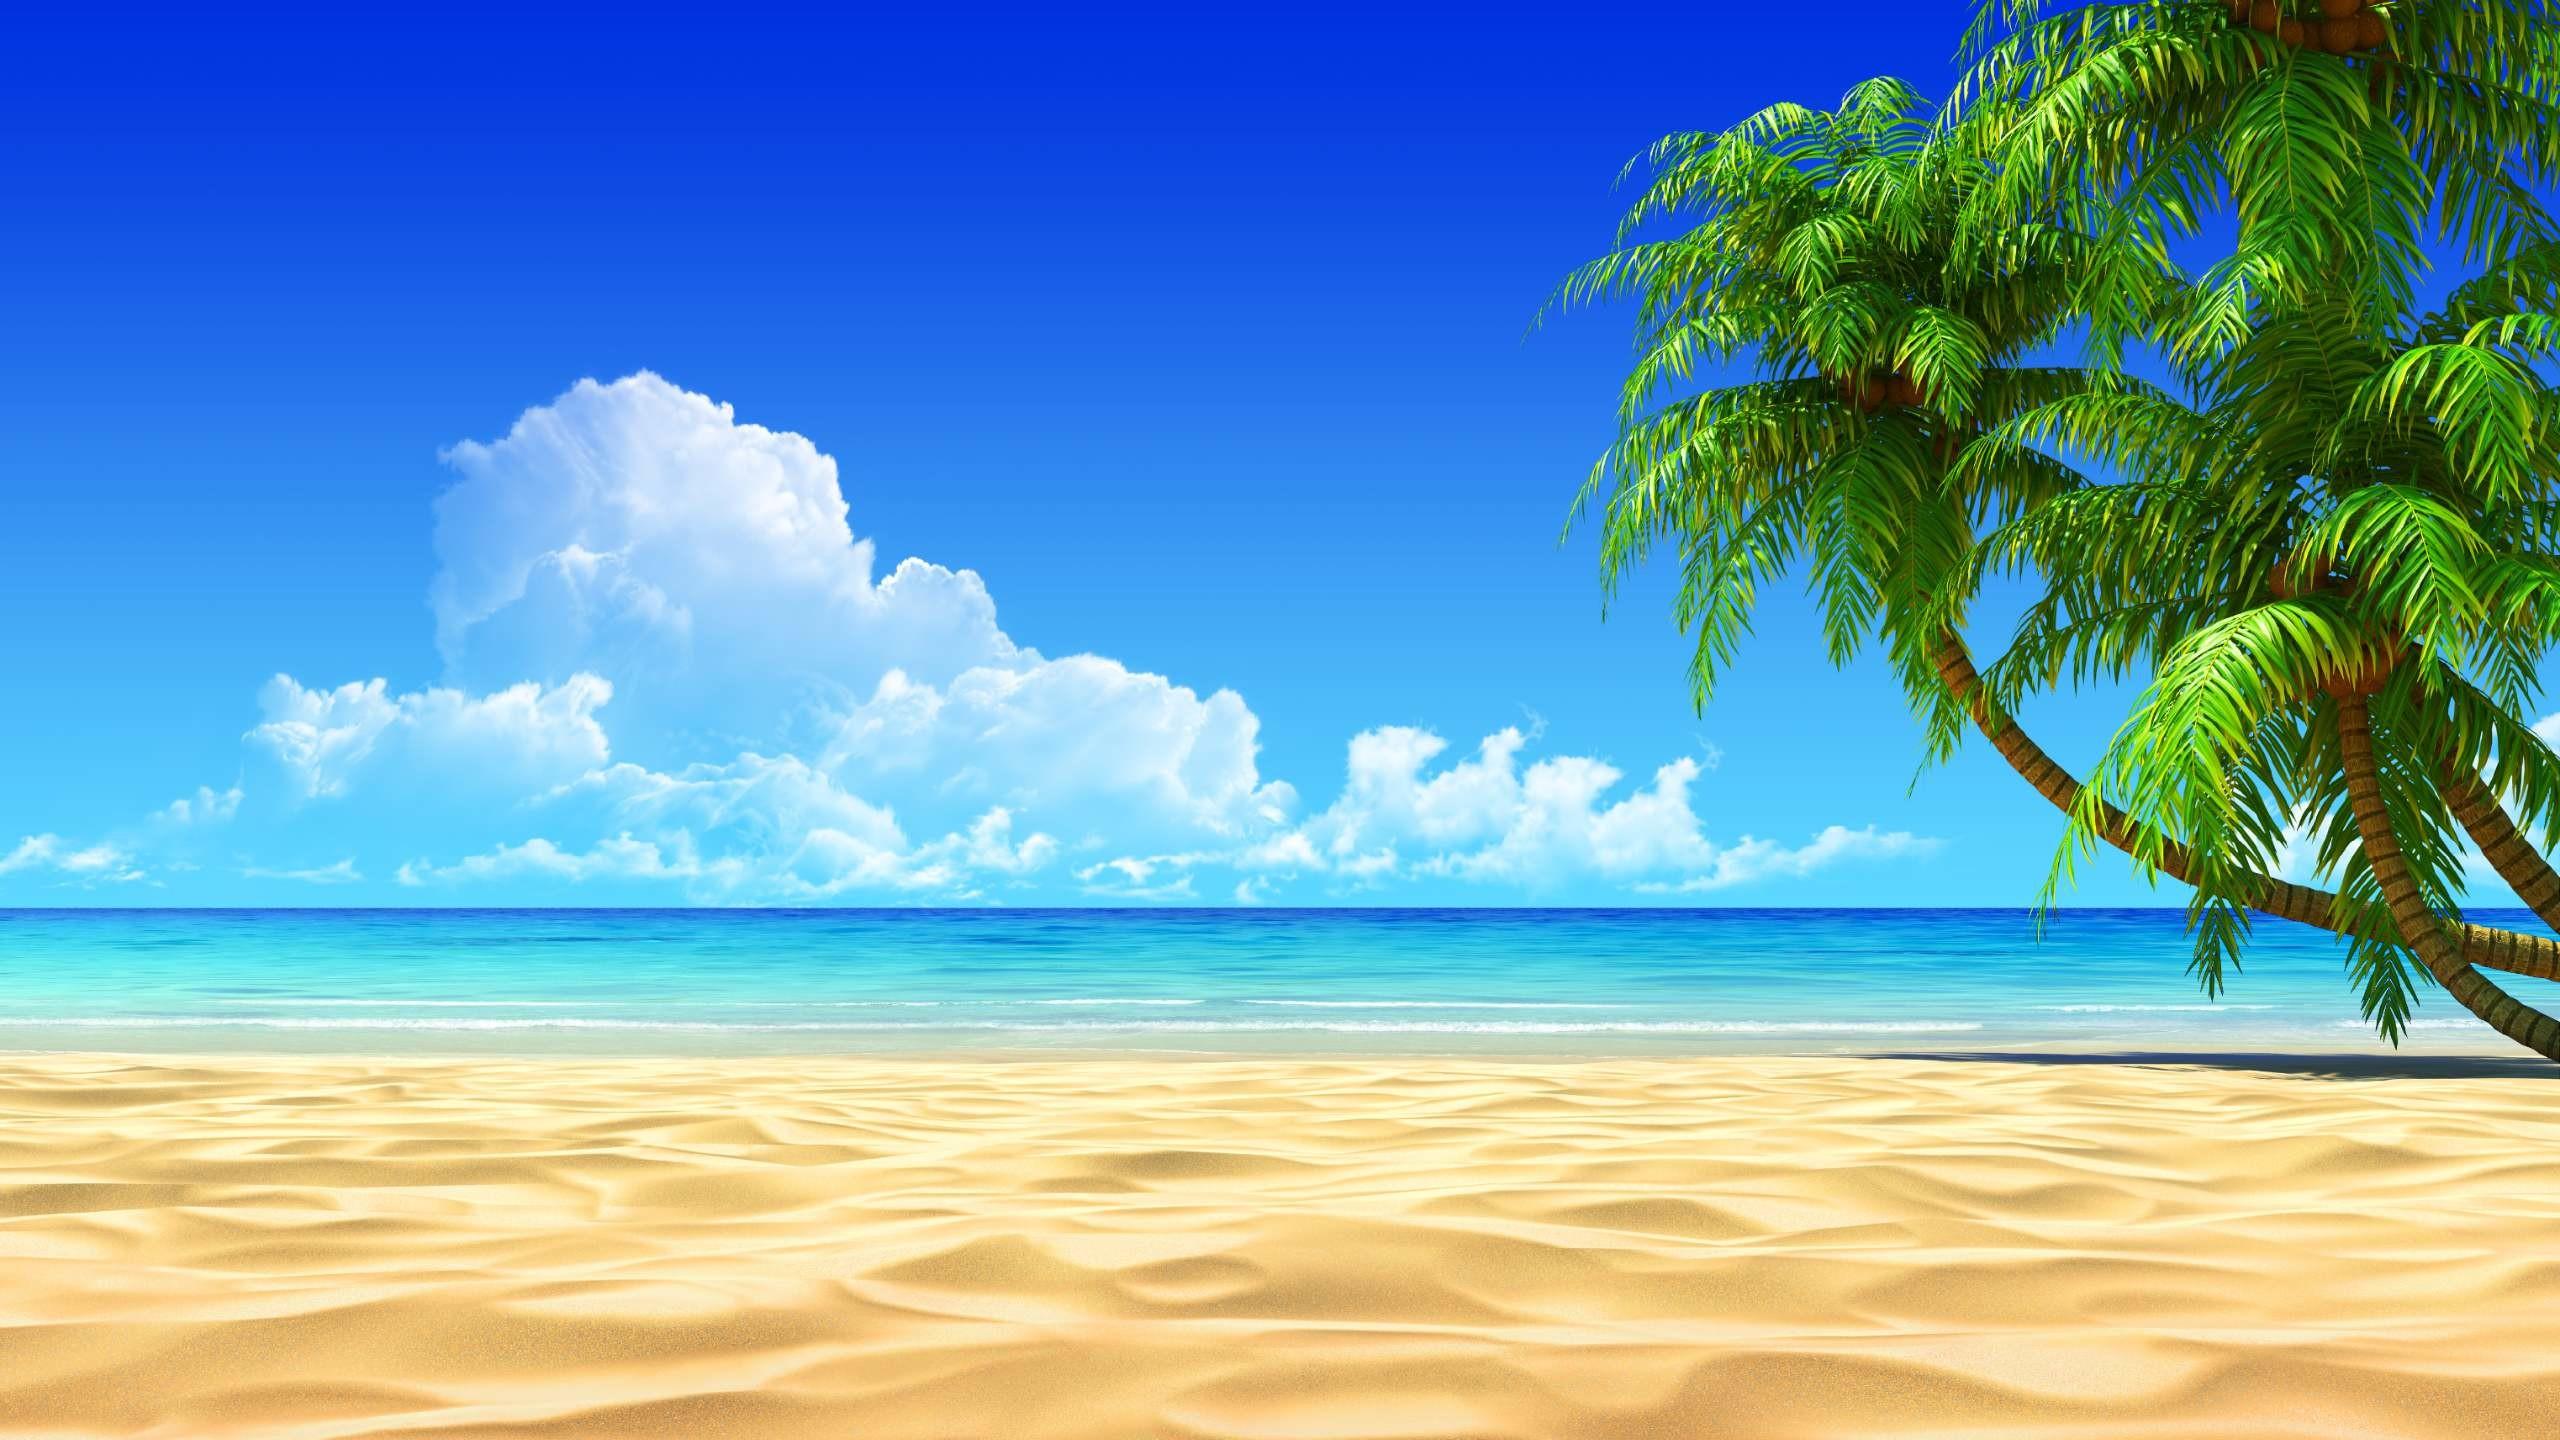 Awesome, Tropical, Beach, Desktop, Background, Hd, Wallpaper .